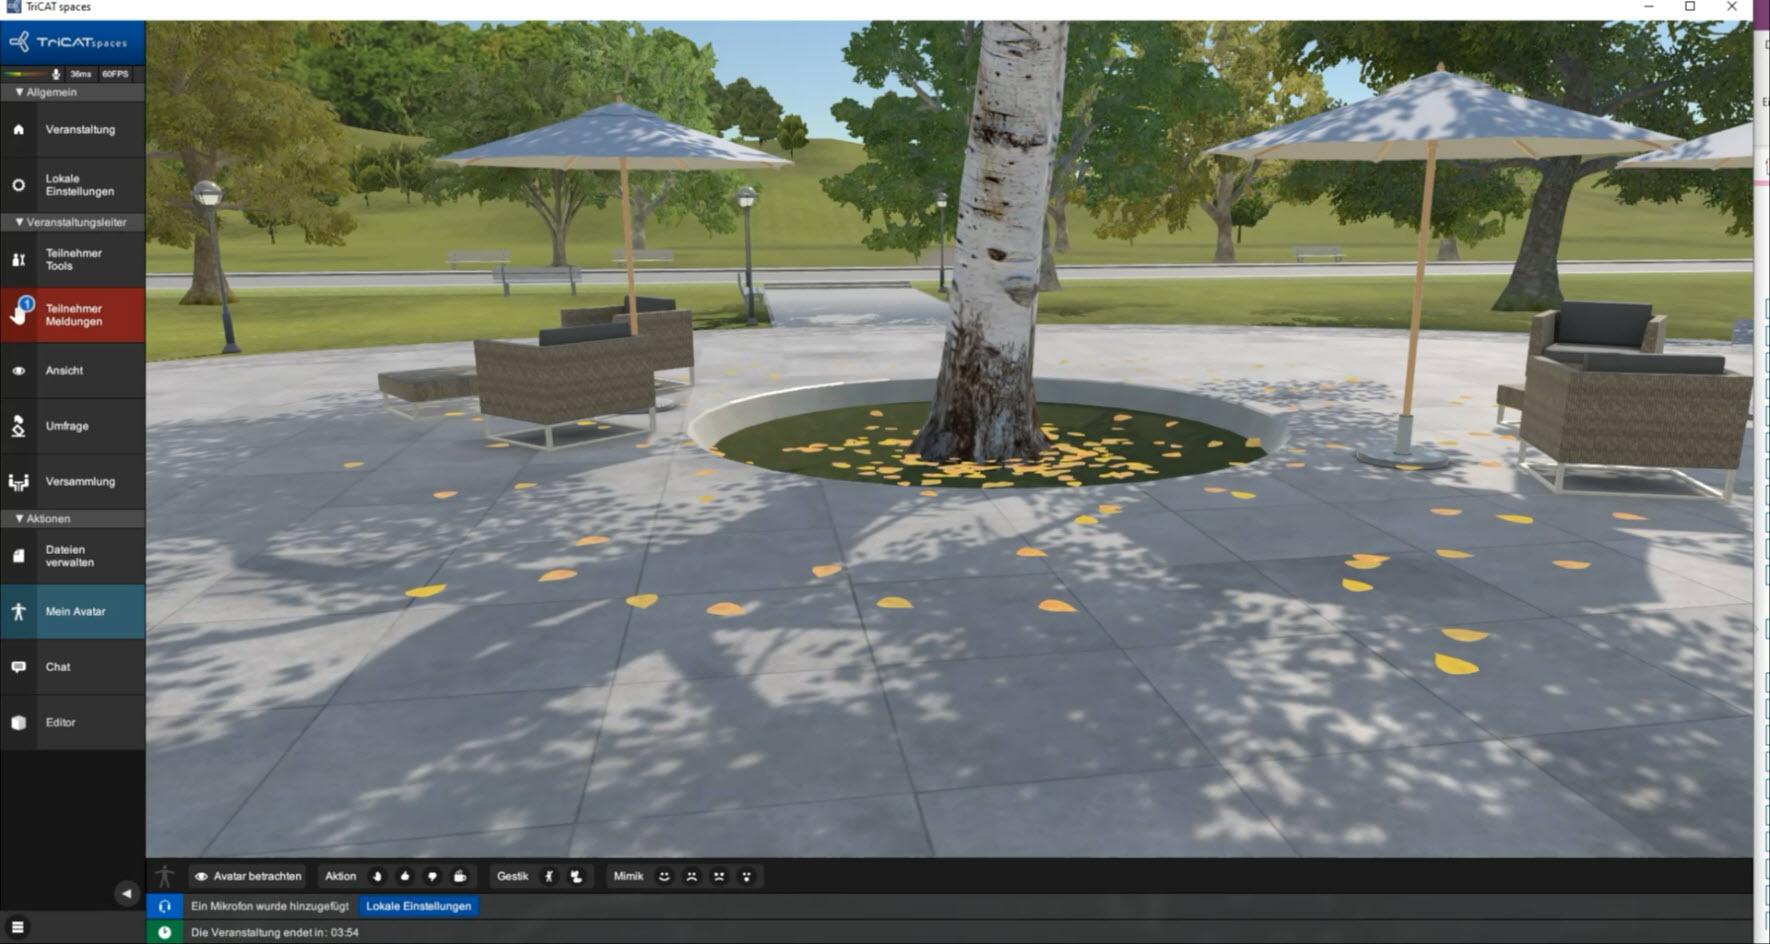 Online-Seminare in der virtuellen 3D Lernumgebung Lern-Atmosphäre